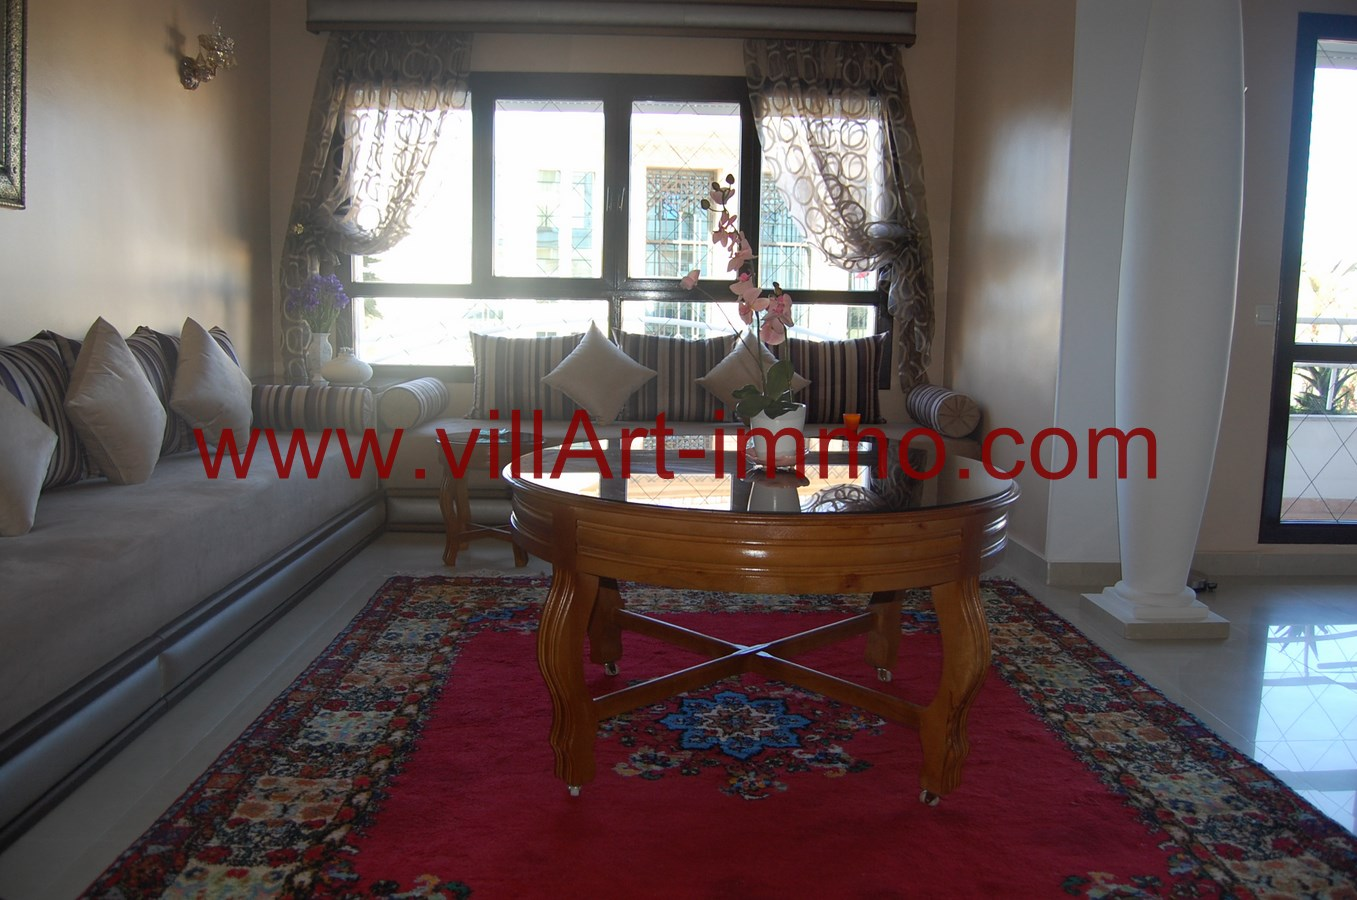 4-location-appartement-meuble-iberia-tanger-double-salon-l895-villart-immo